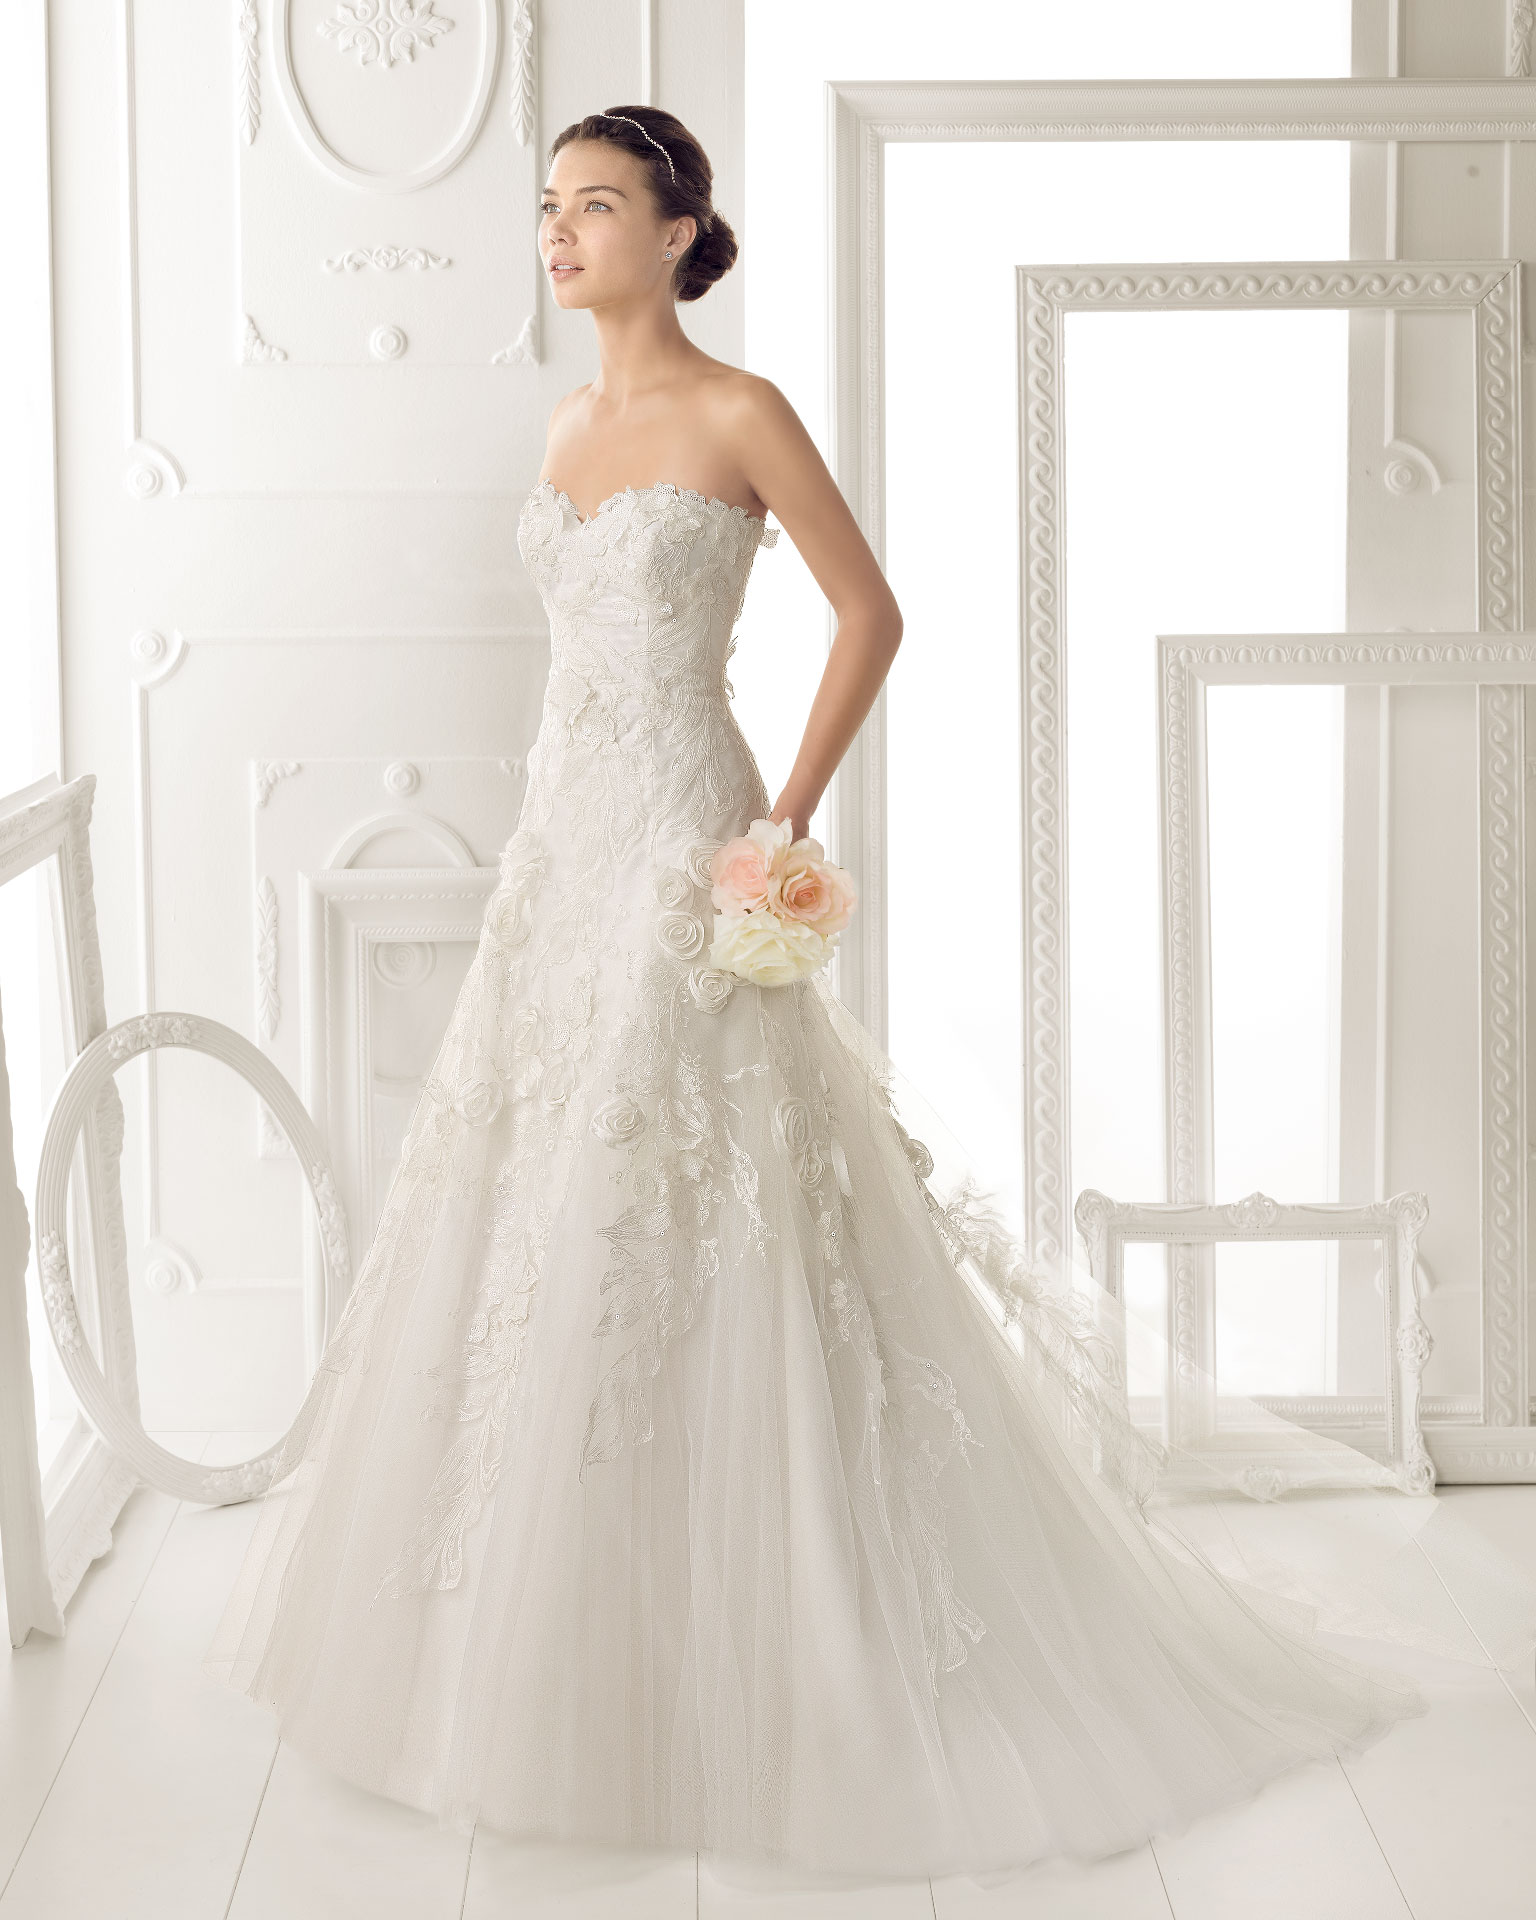 Aire barcelona wedding dress 2014 bridal ozor for Wedding dresses in barcelona spain